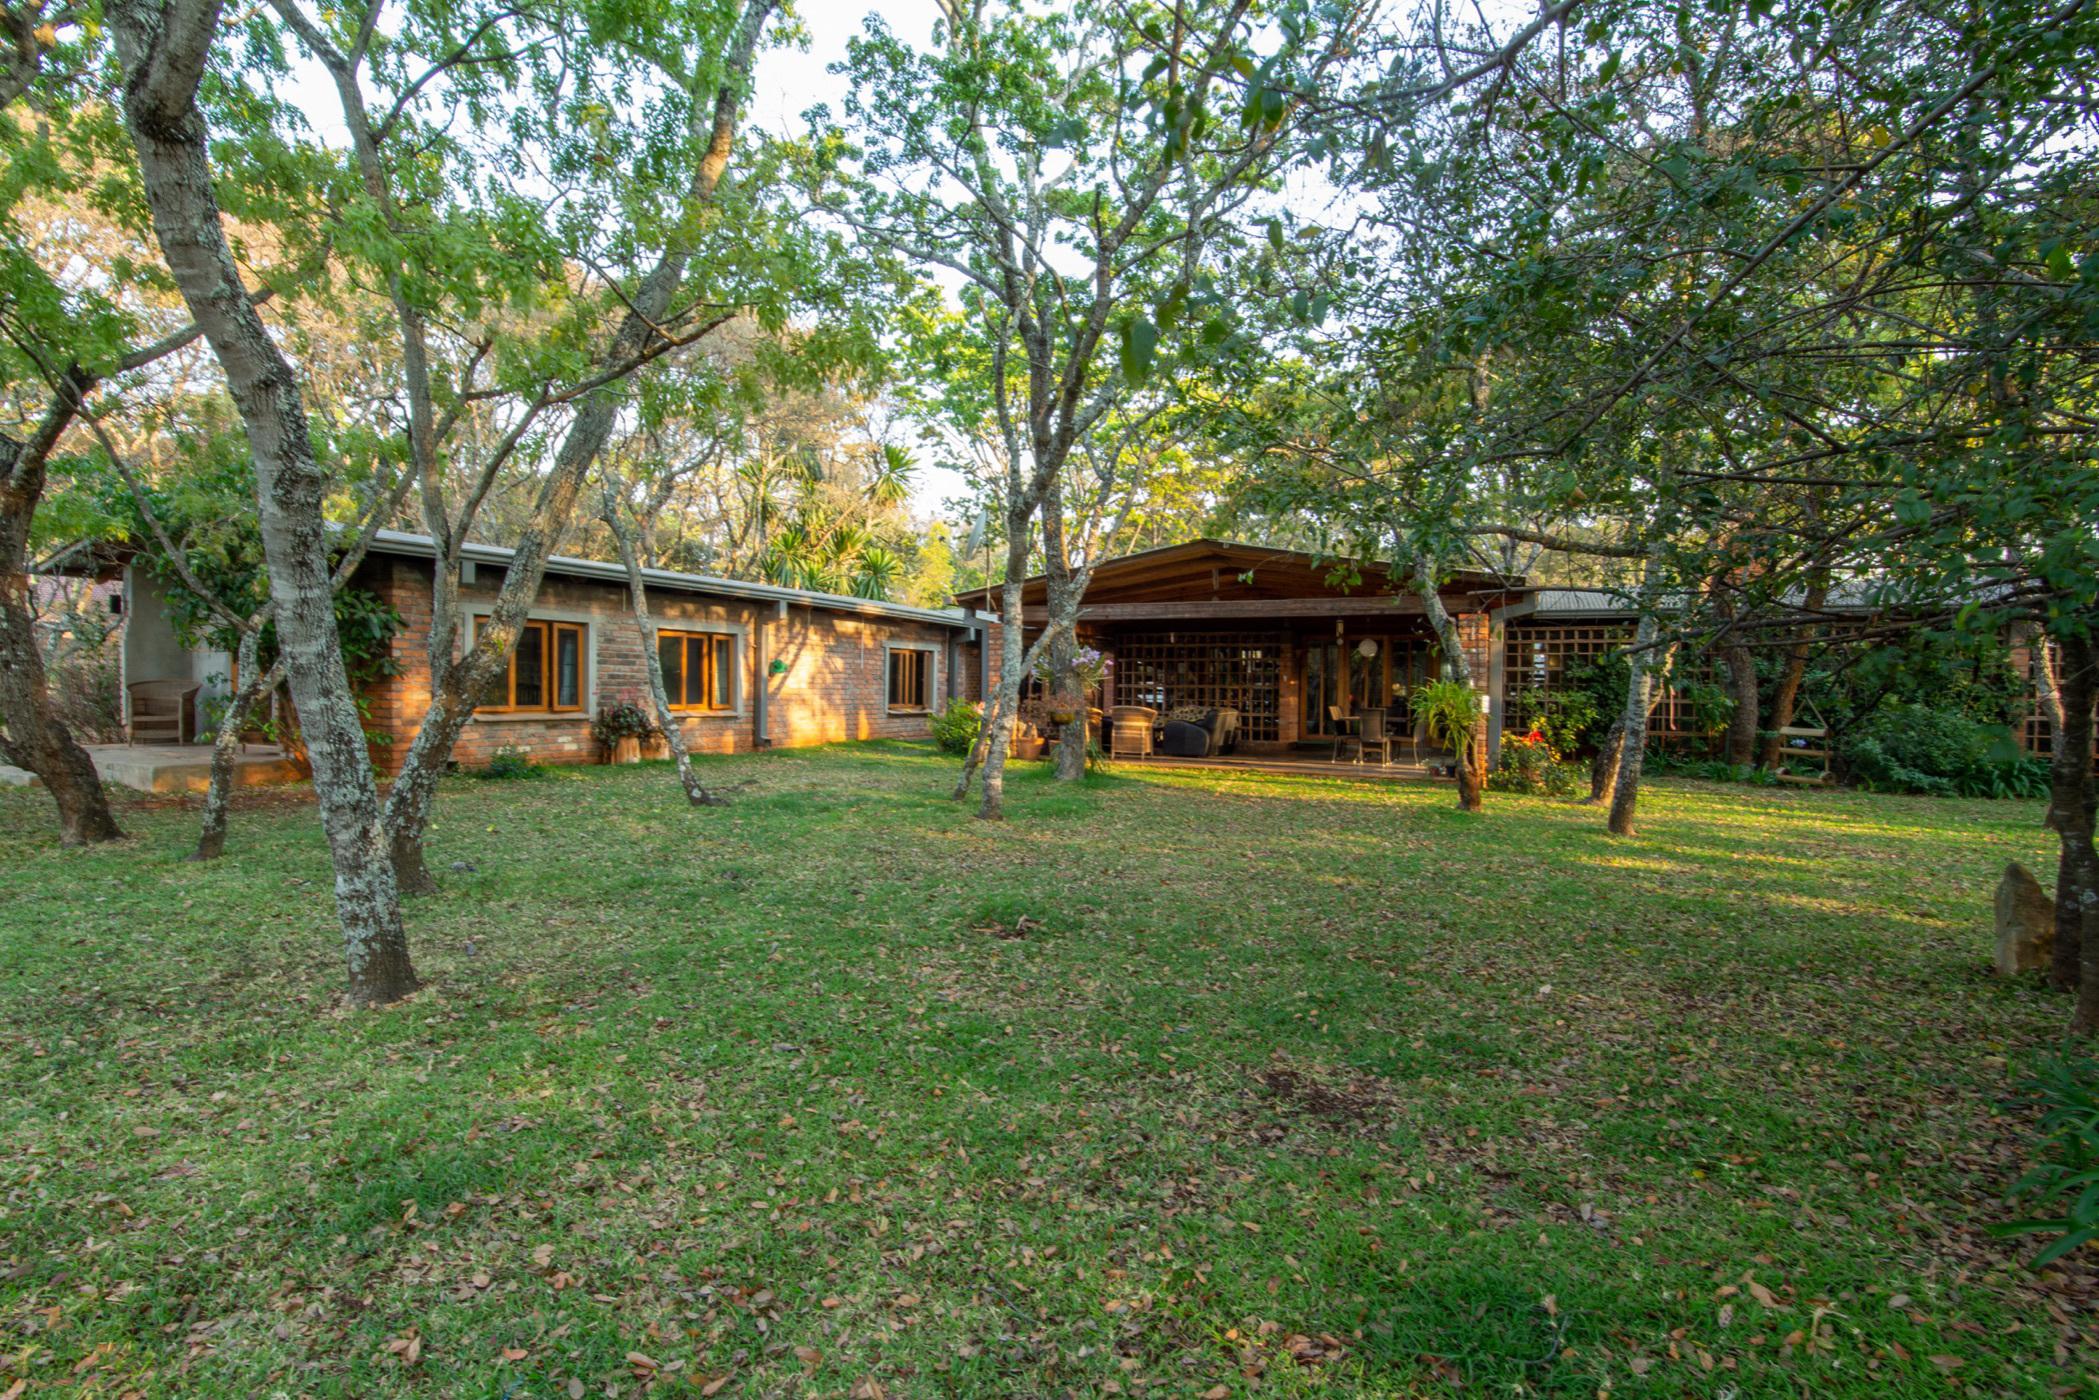 3 bedroom house for sale in Greendale (Zimbabwe)